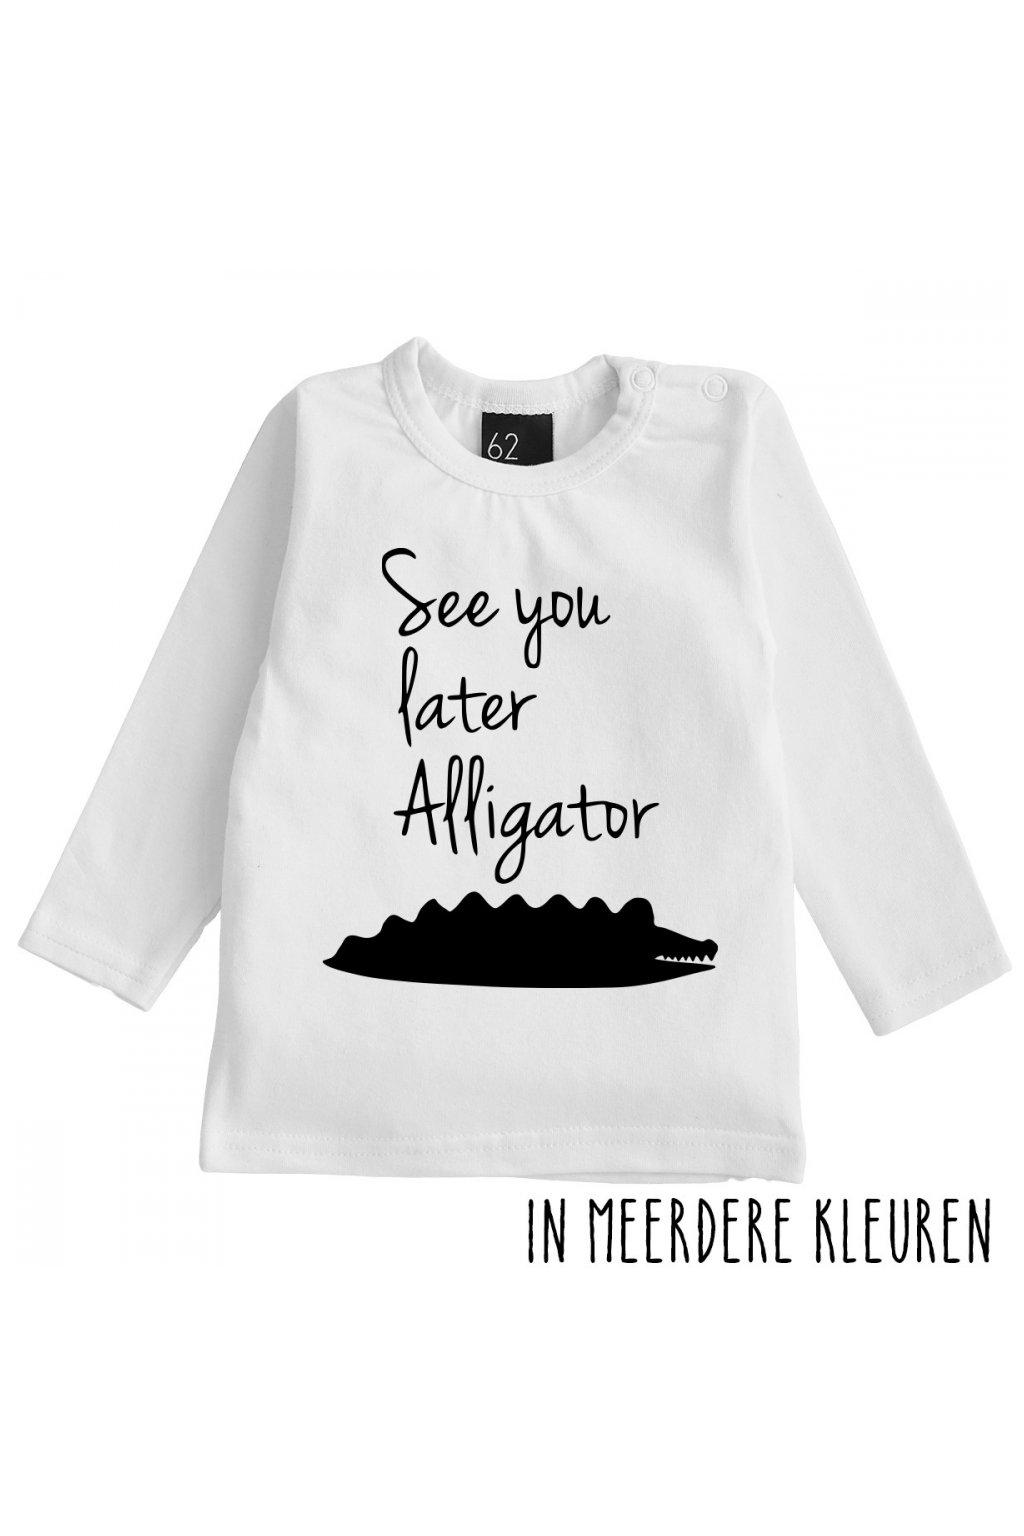 see you later alligator longsleeve shirt babystyling wit zwart (1)